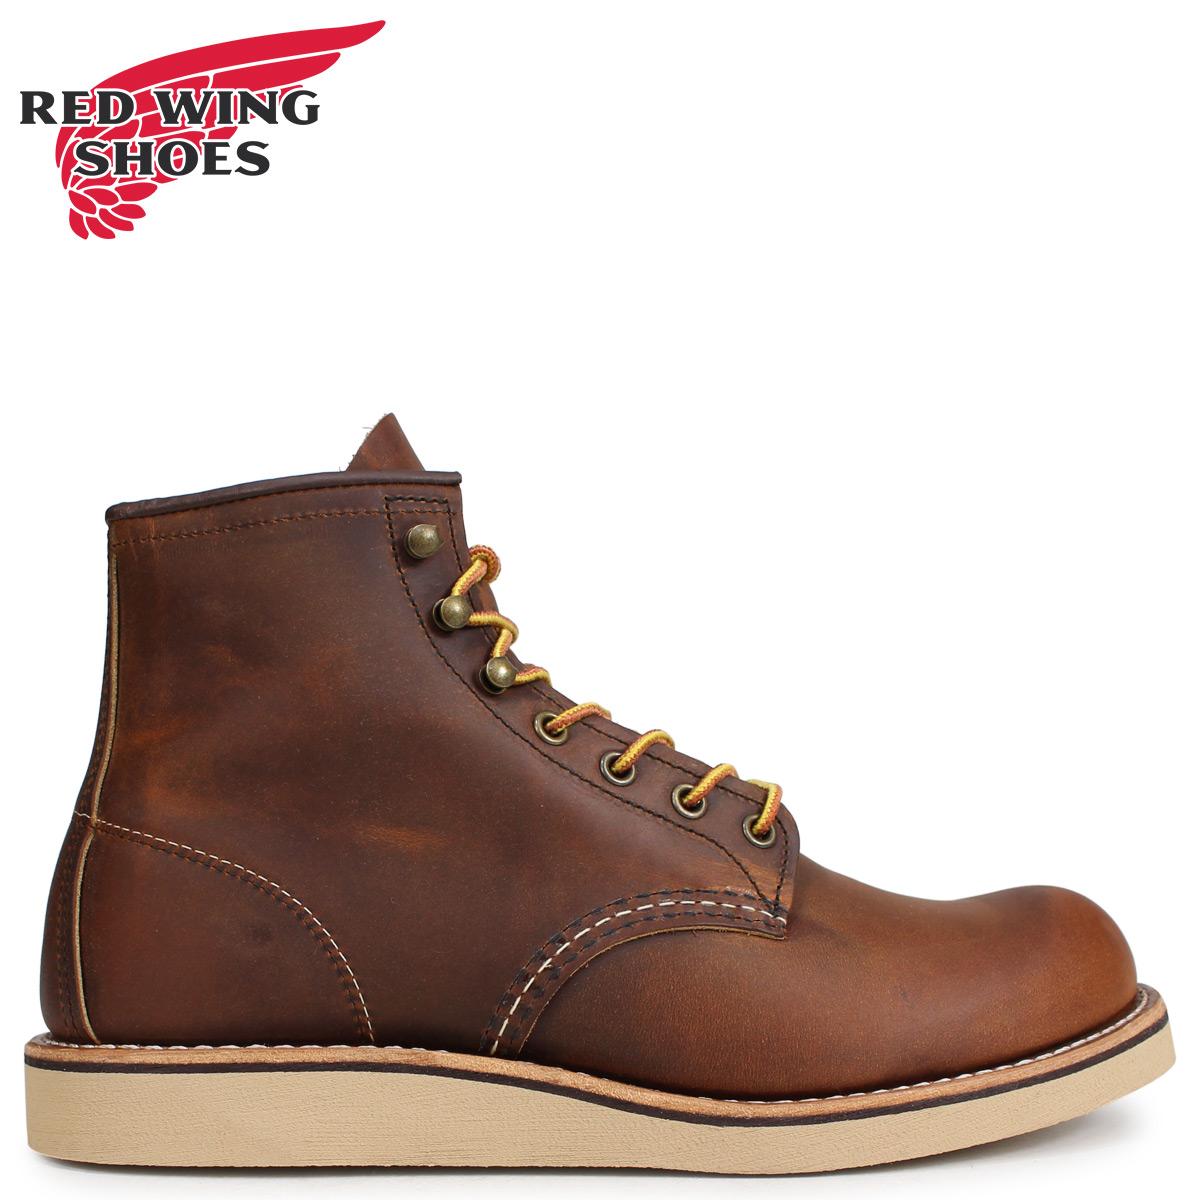 RED WING レッドウィング ブーツ ローバー メンズ HERITAGE ROVER BOOT Dワイズ ブラウン 2950